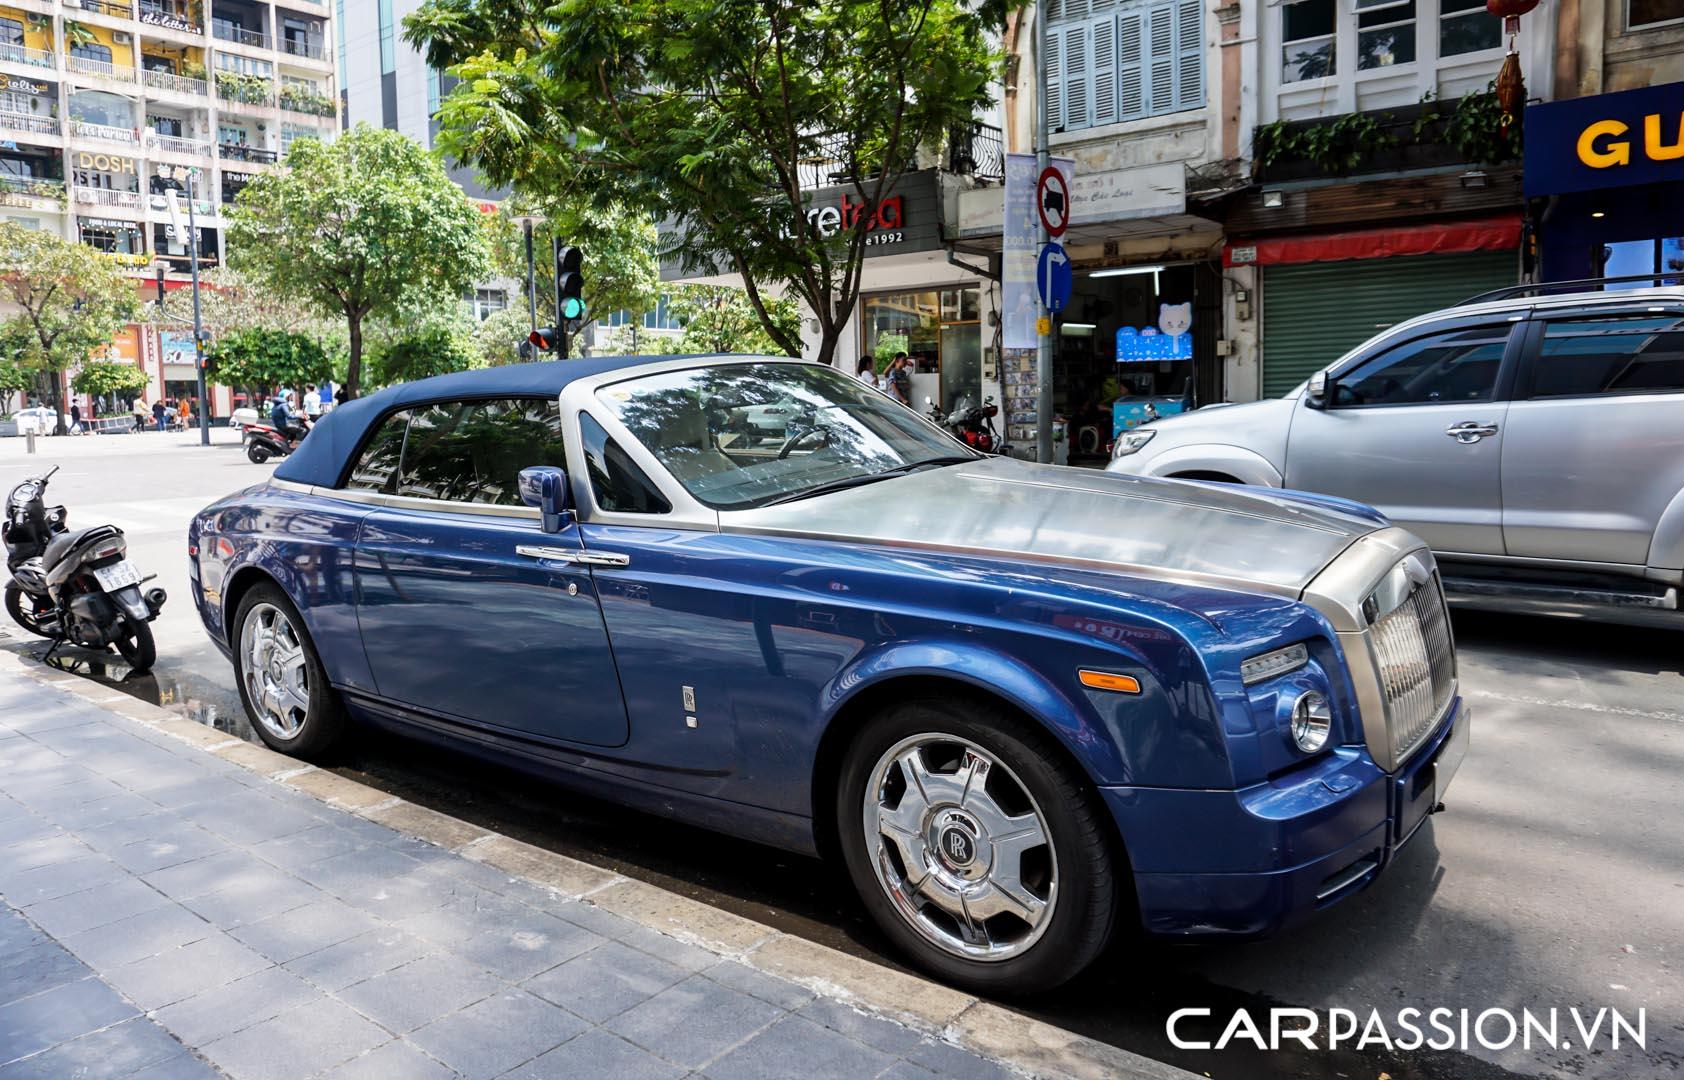 CP-Rolls-Royce Phantom Drophead Coupe xanh (4).jpg